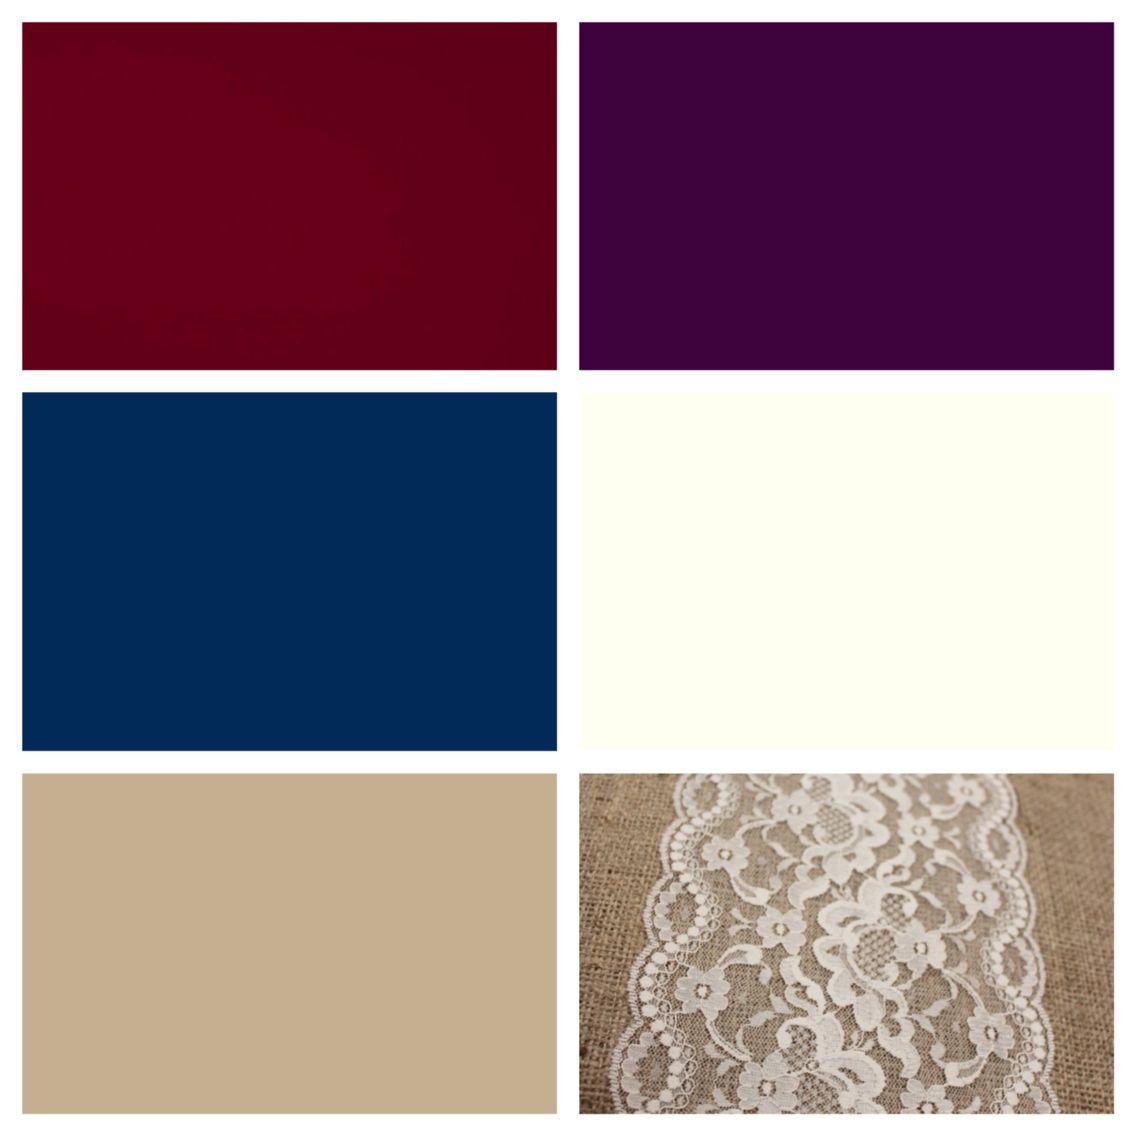 Wedding Color Scheme Burgundy Plum Navy Ivory And Khaki With